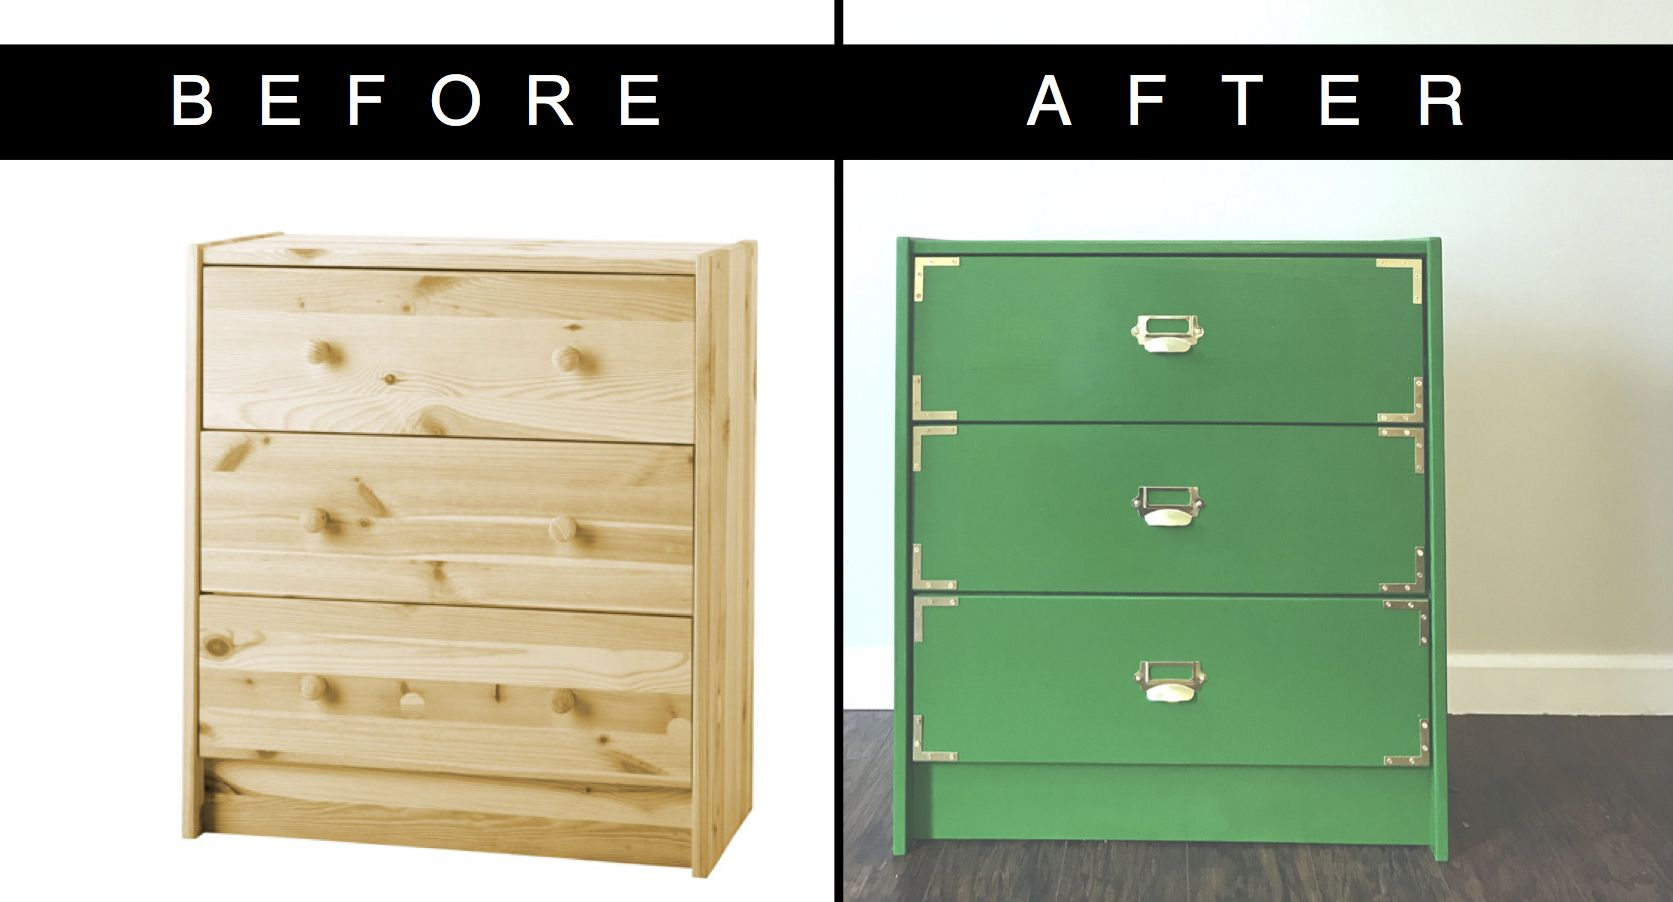 Ikea Rast Hack Campaign Dresser Midcenturymodern Hack Green Highgloss Campaign Furniture Diy Painting Diy Dresser Campaign Dresser Ikea Hack